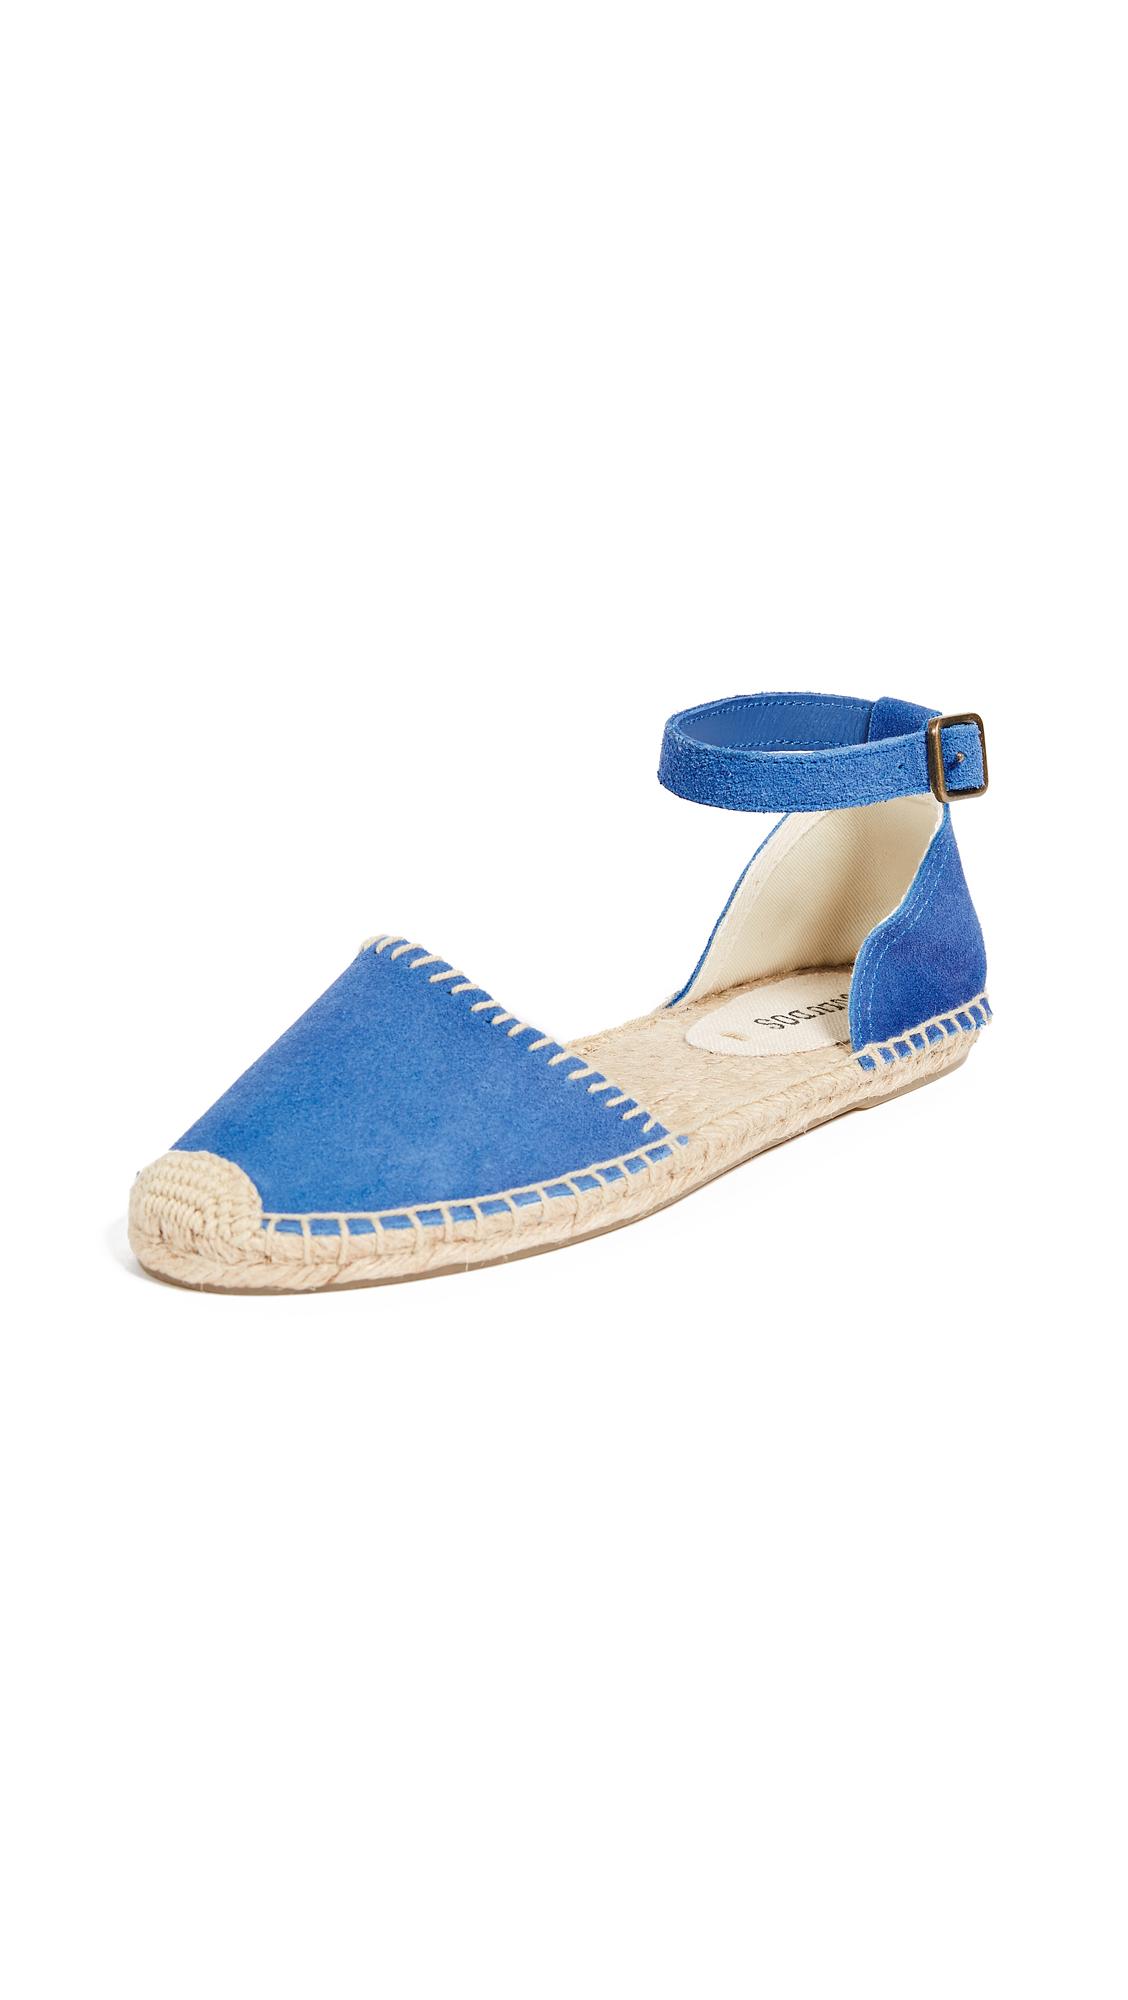 Soludos DOrsay Espadrille Flats - Marlin Blue